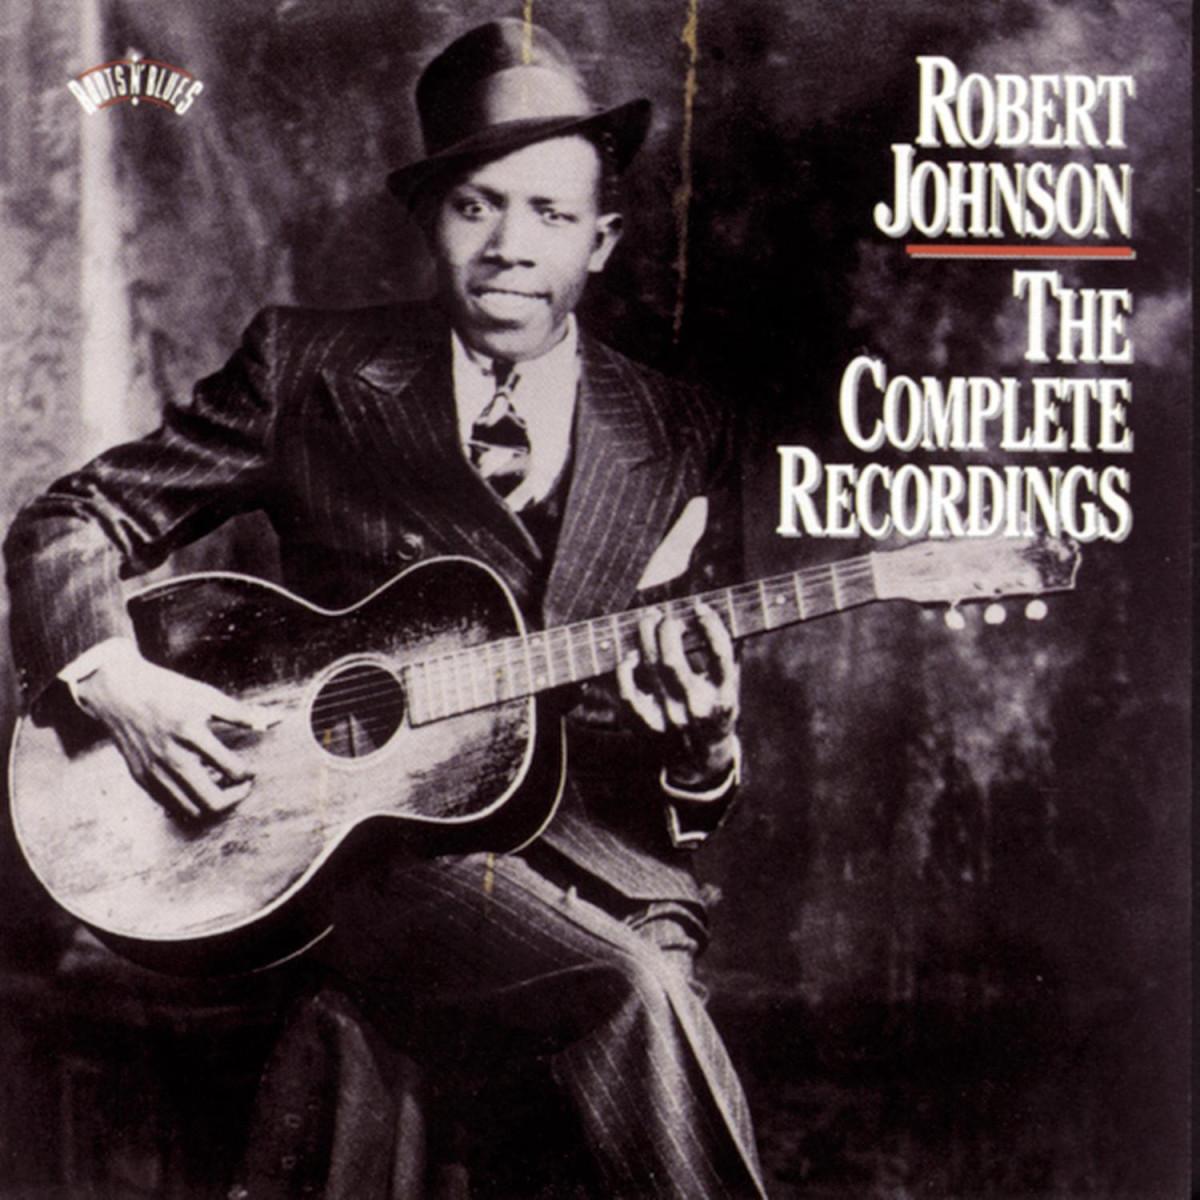 Robert Johnson, The Complete Recordings